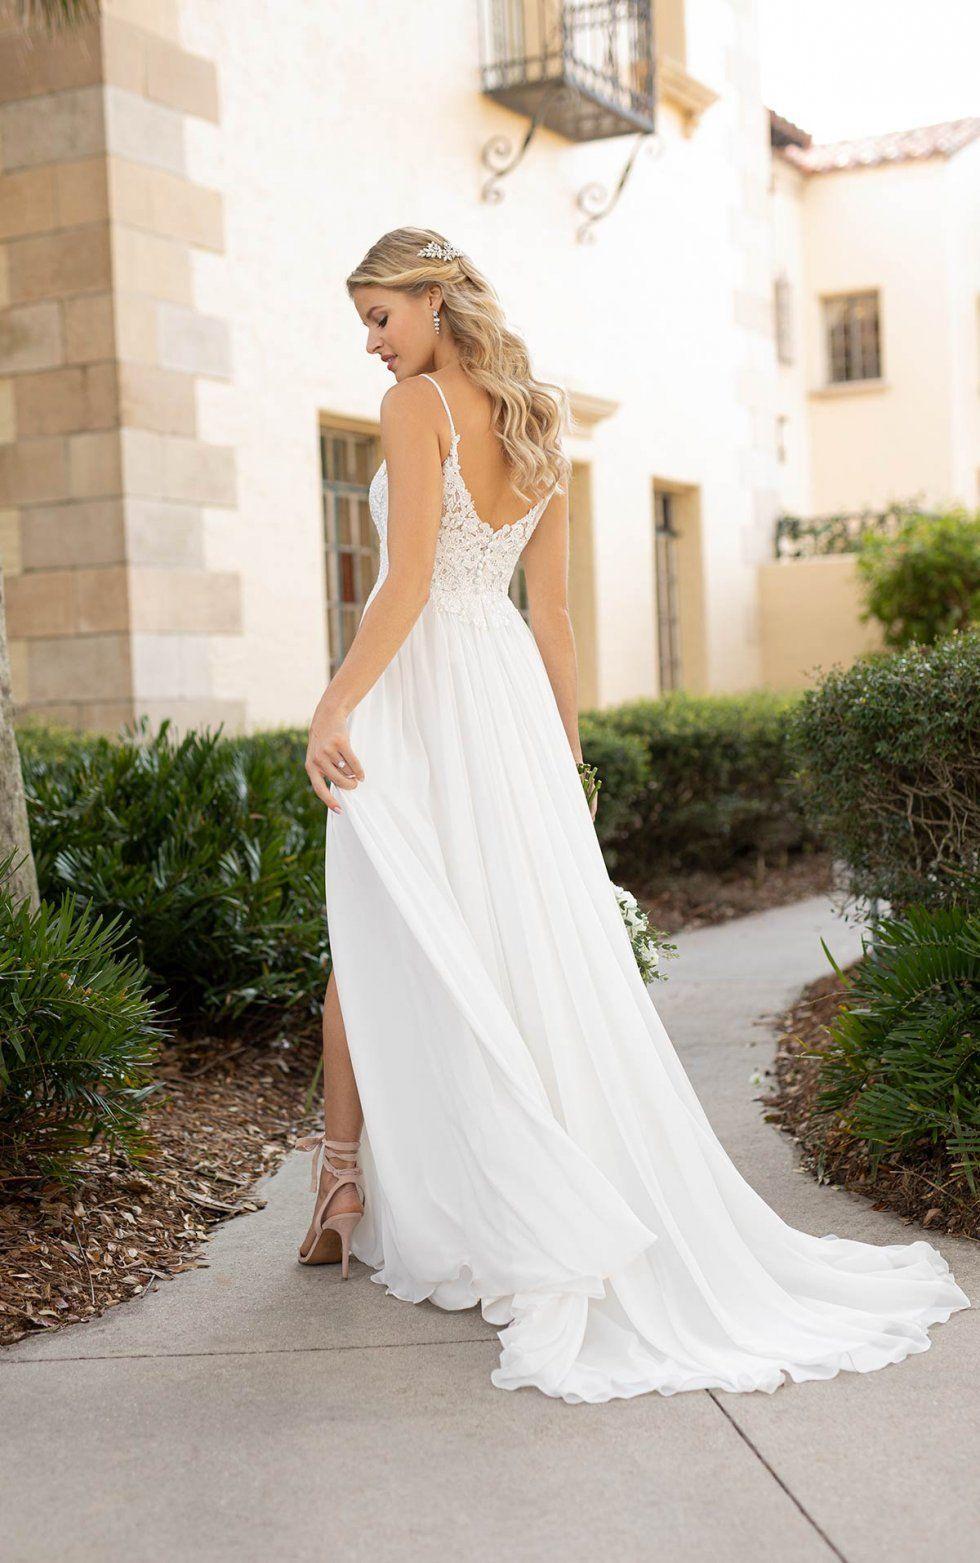 Summer Style Lace Long Sleeve Wedding Dresses 2016 V Neck A Line Lace Wedding Dress Beading Beach Bridal Go Boncuklu Gelinlik Gelinlik Plaj Dugunu Gelinlikleri [ 1292 x 1000 Pixel ]